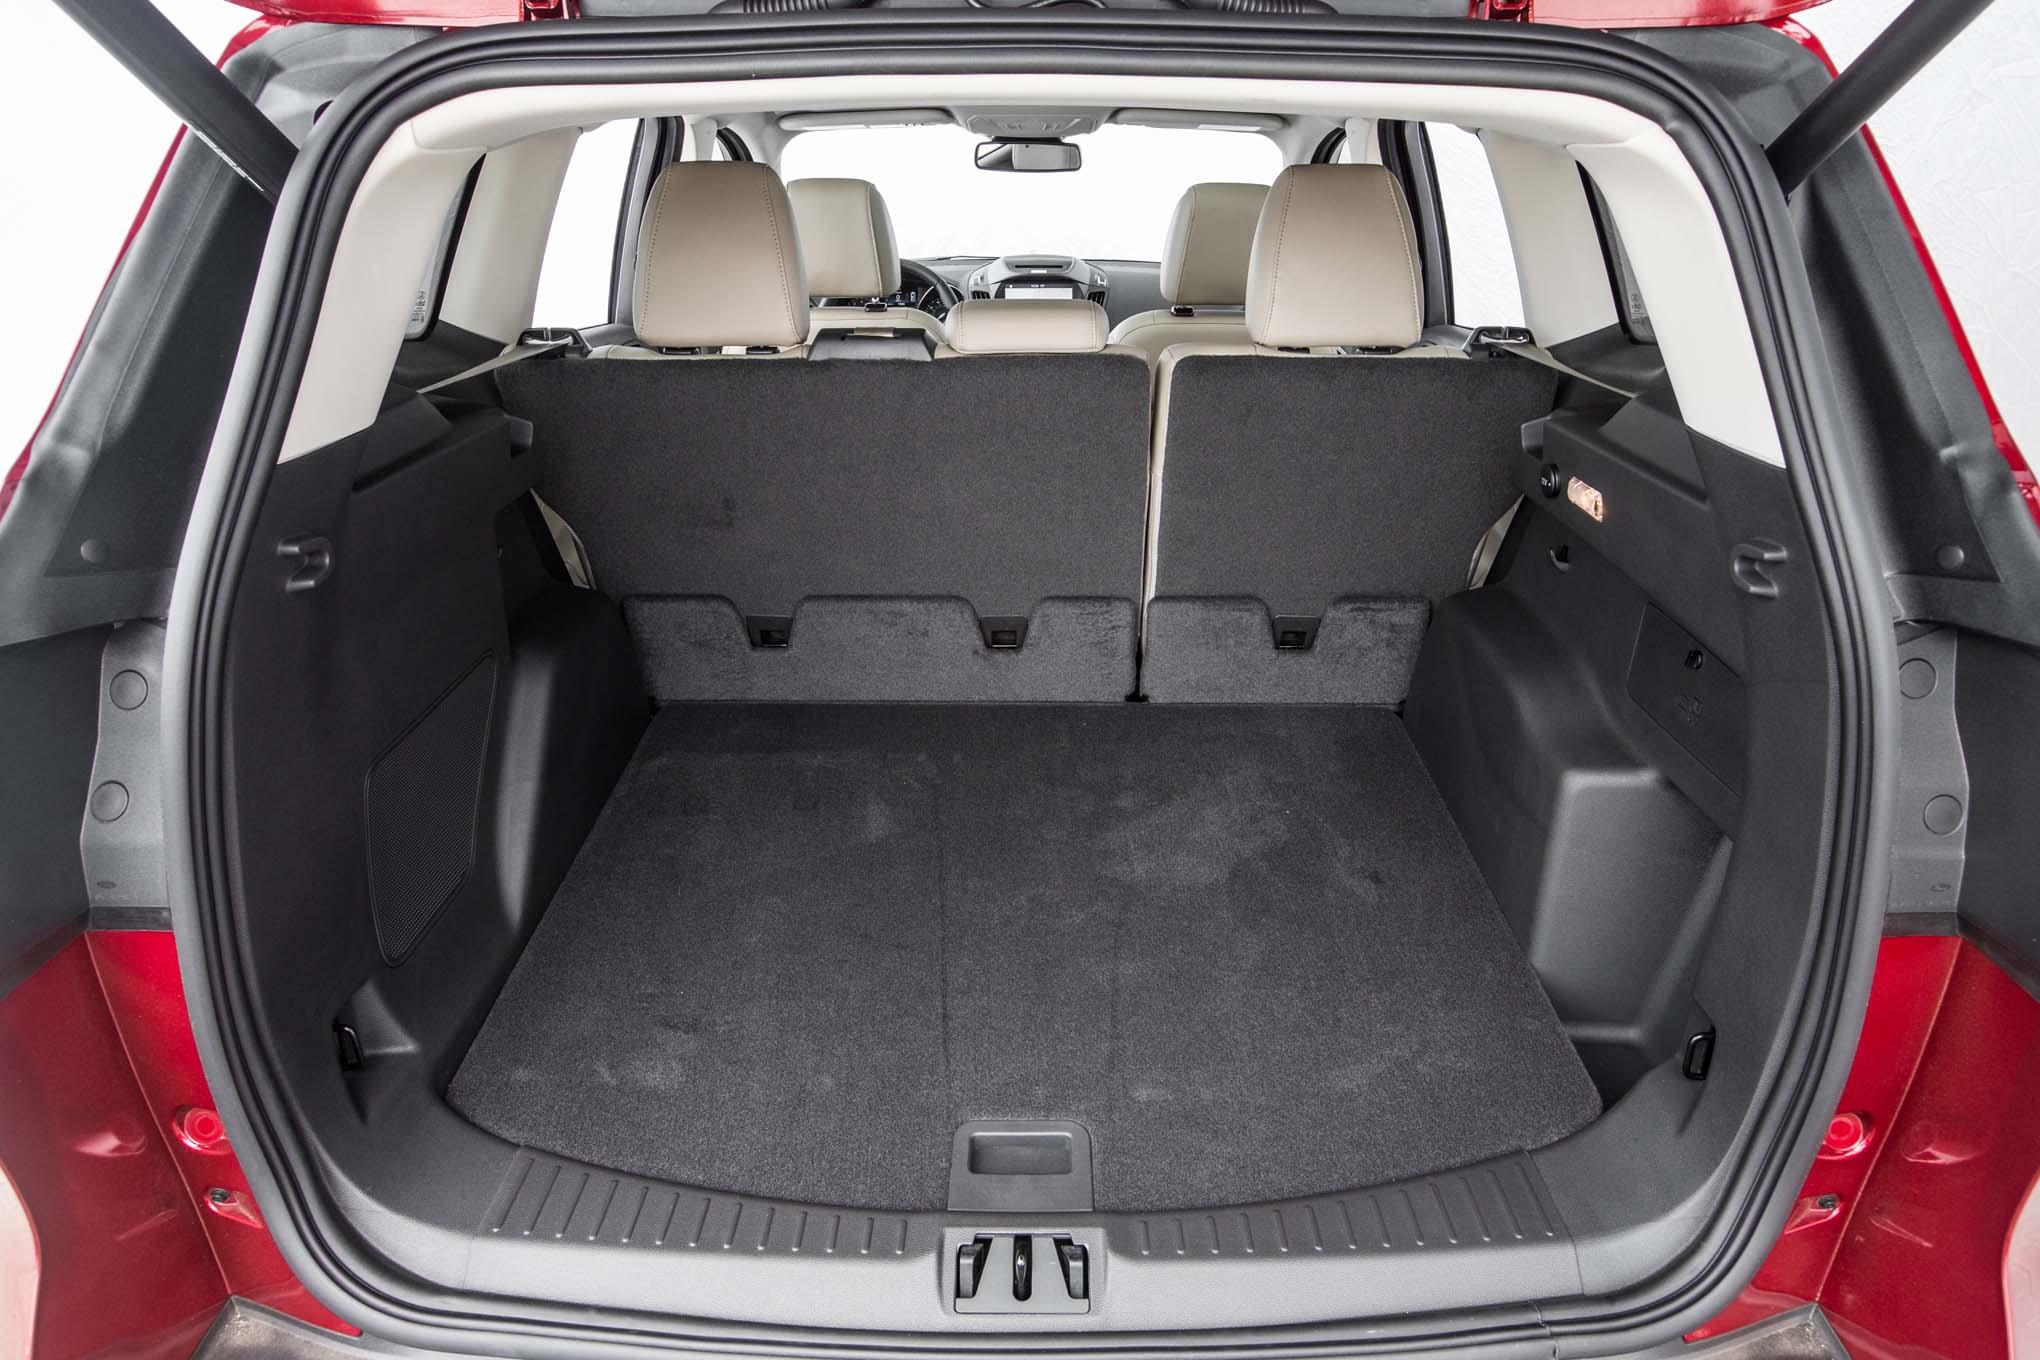 Ford Escape 2 0 Ecoboost Awd 2017 Primera Prueba Motor